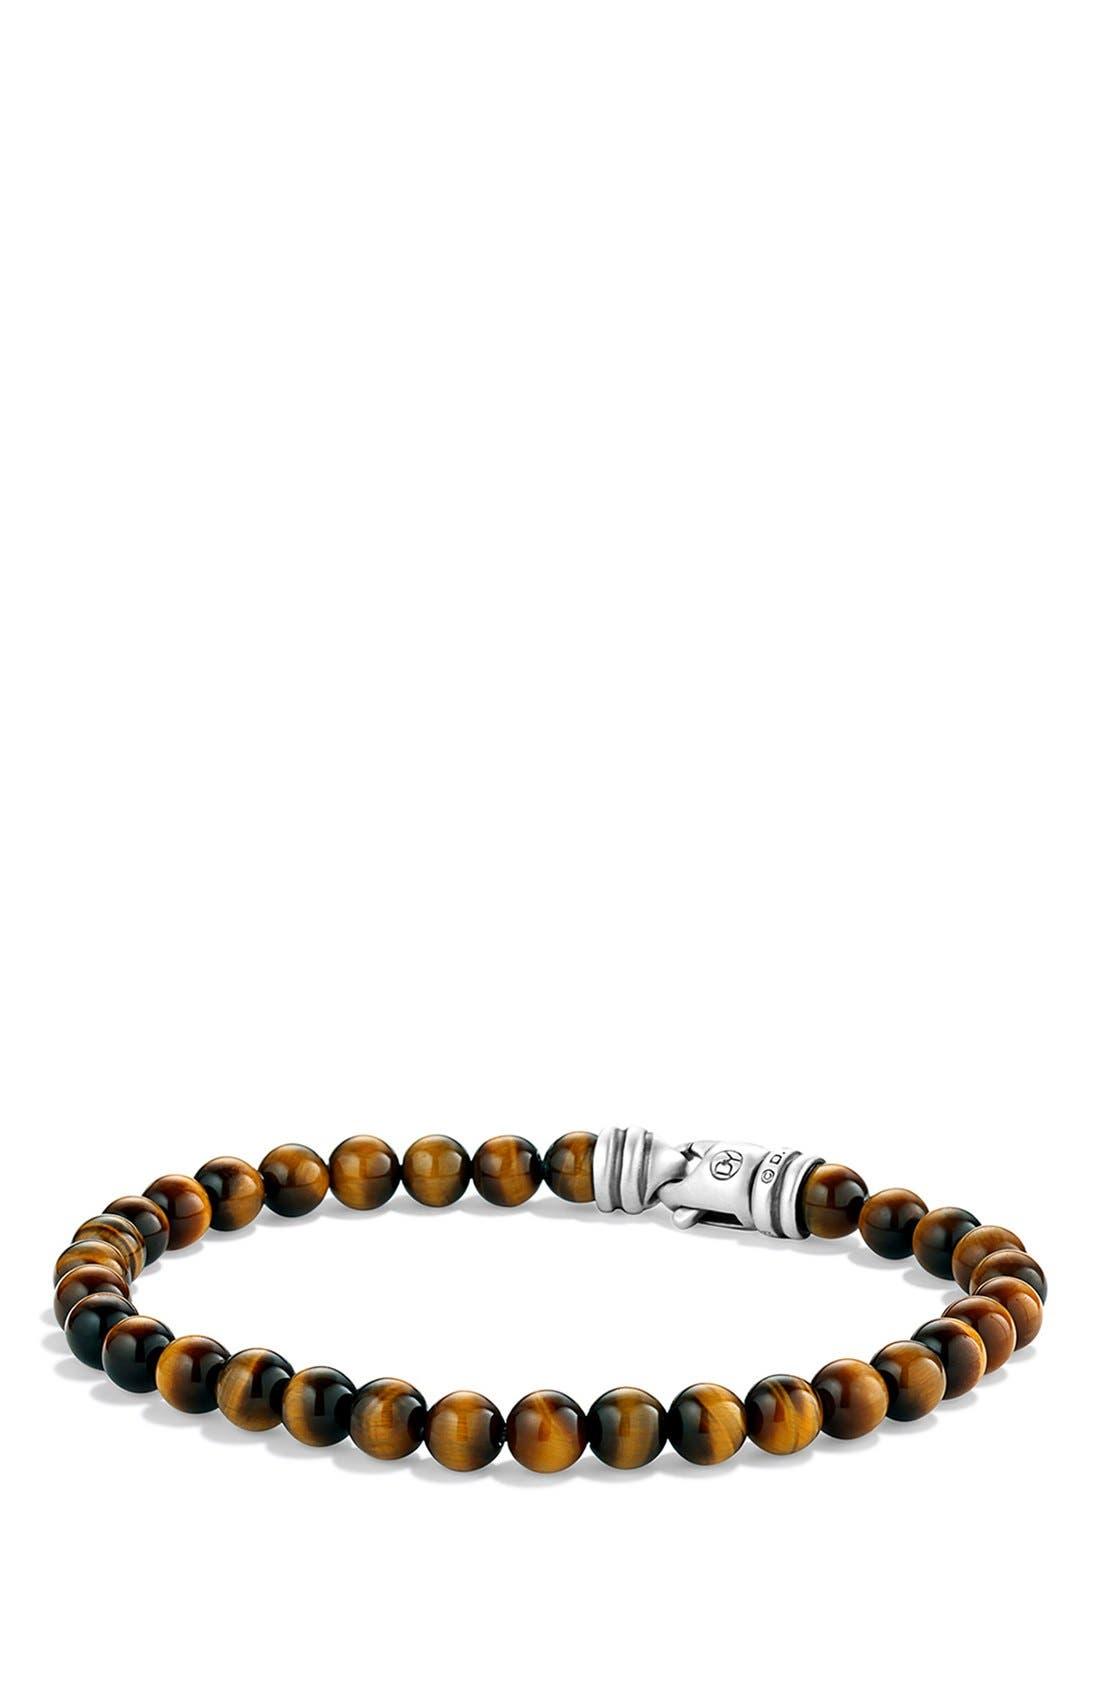 David Yurman 'Spiritual Beads' Bracelet